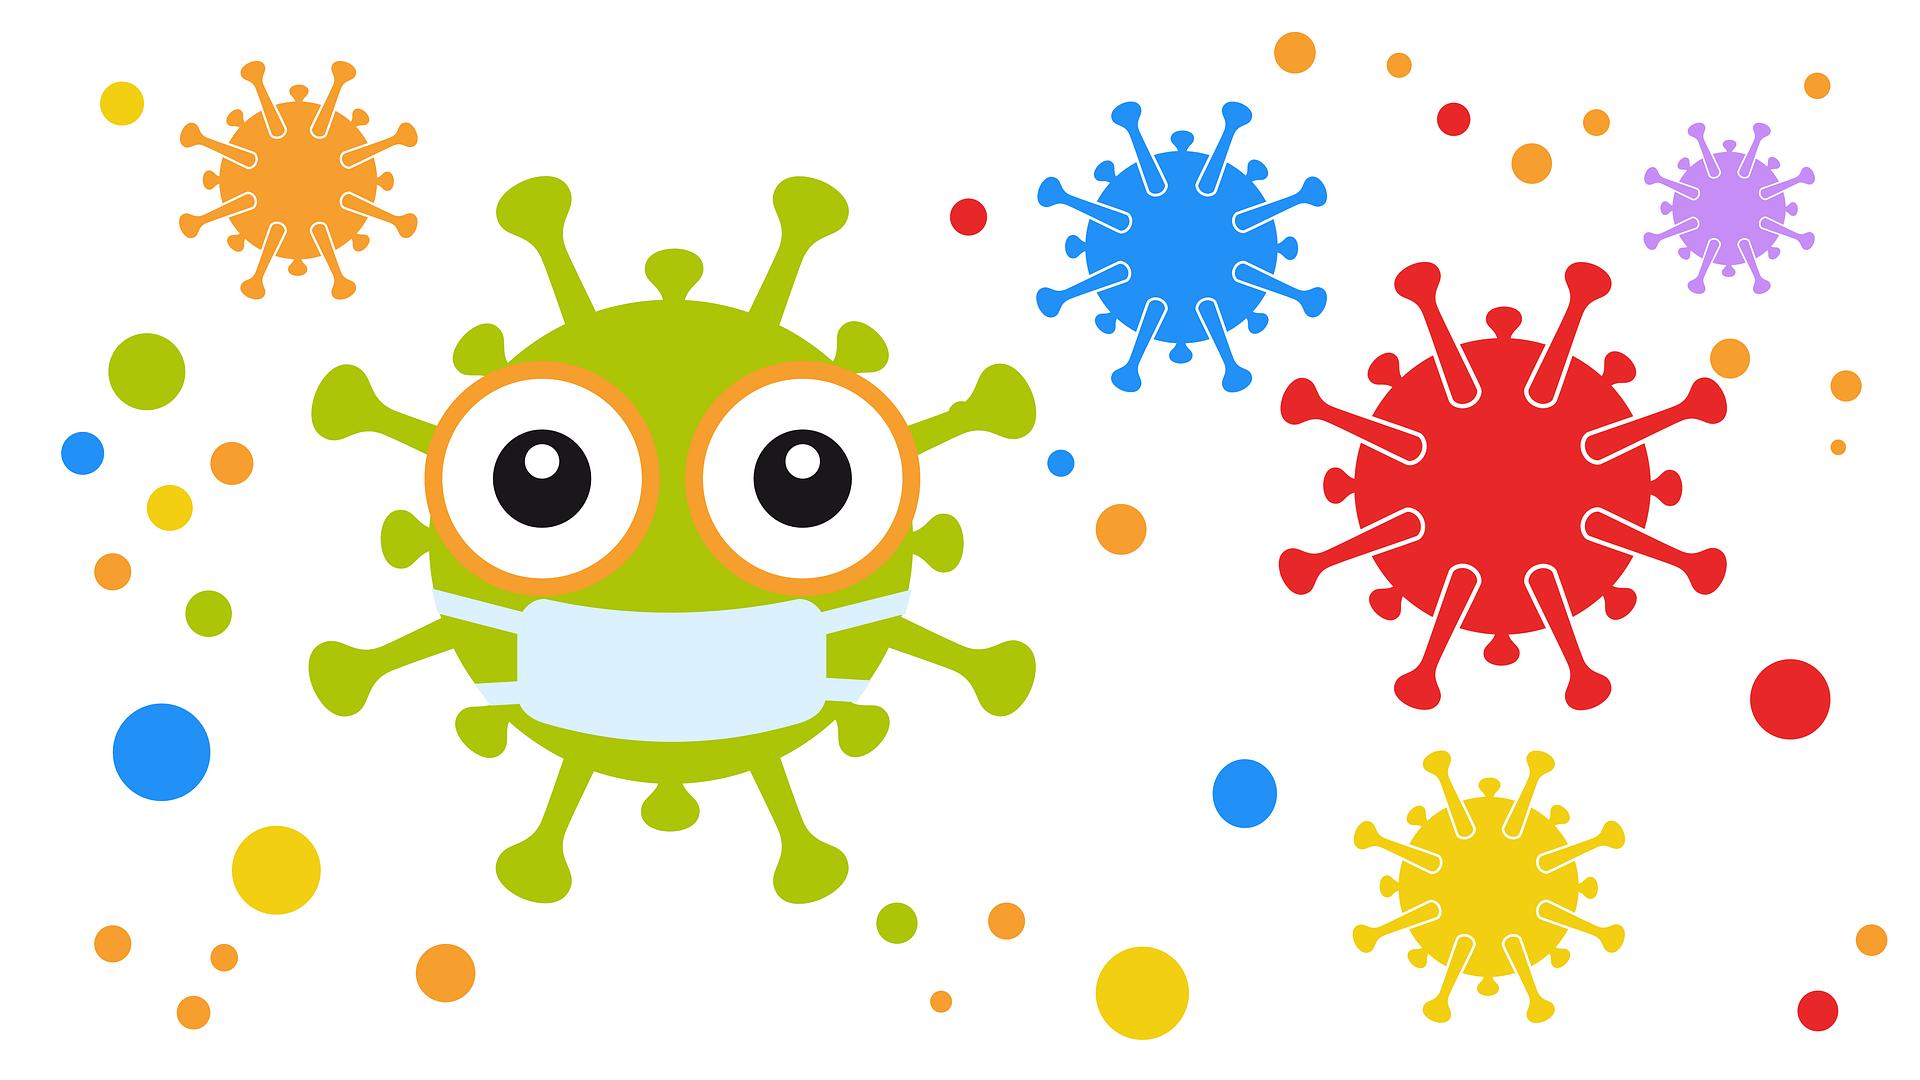 Manigance nouvelle coronavirus COVID-19